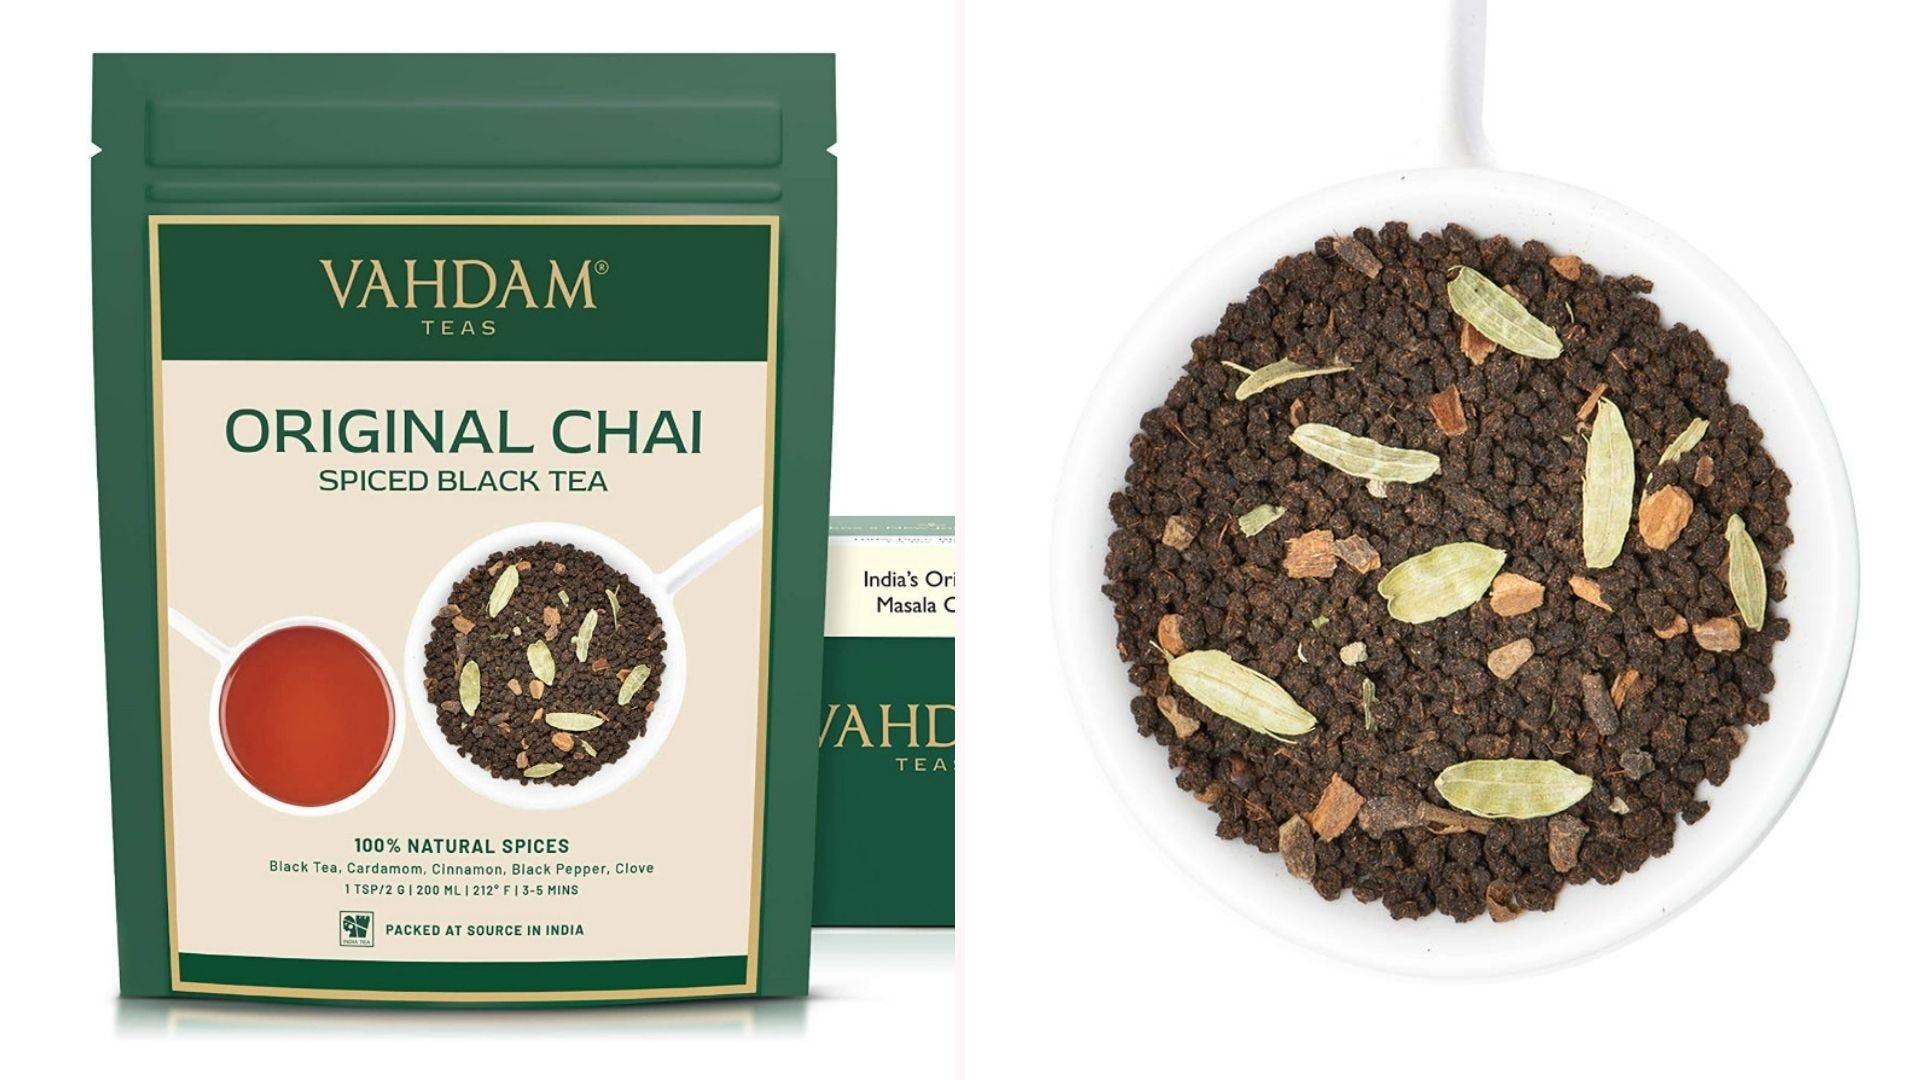 Té chai original de Vahdam.